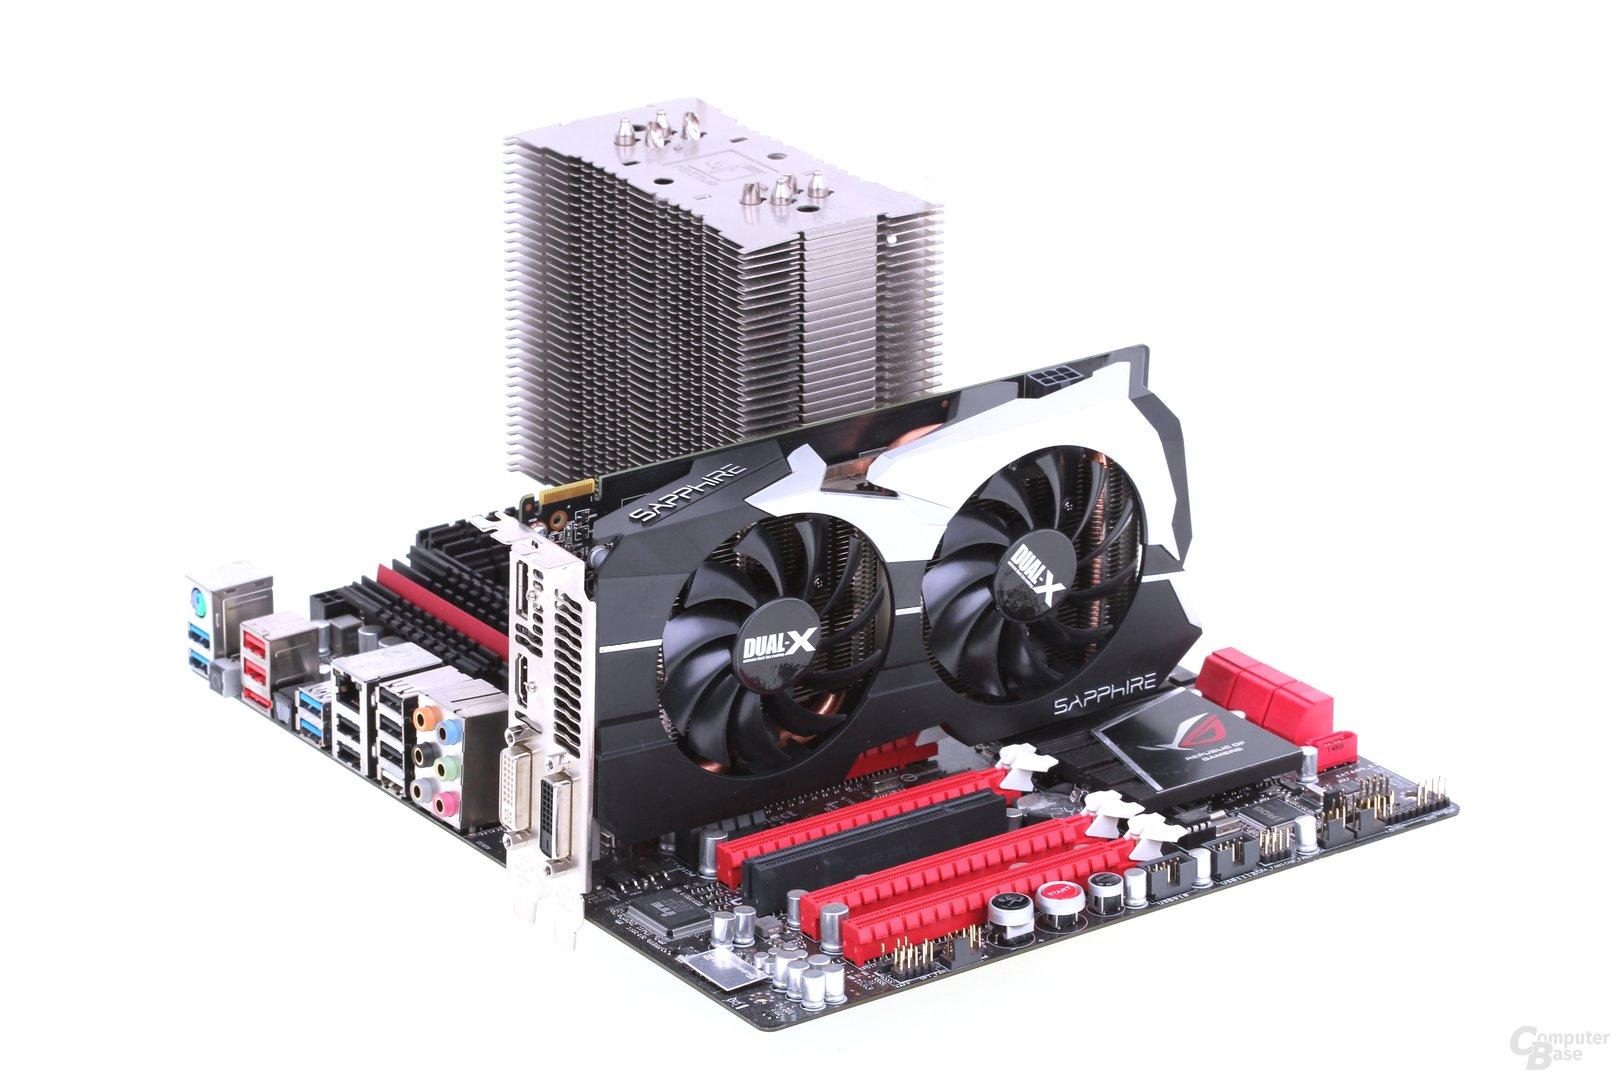 Sapphire Radeon HD 7790 Dual-X OC auf Asus Crosshair V Formula